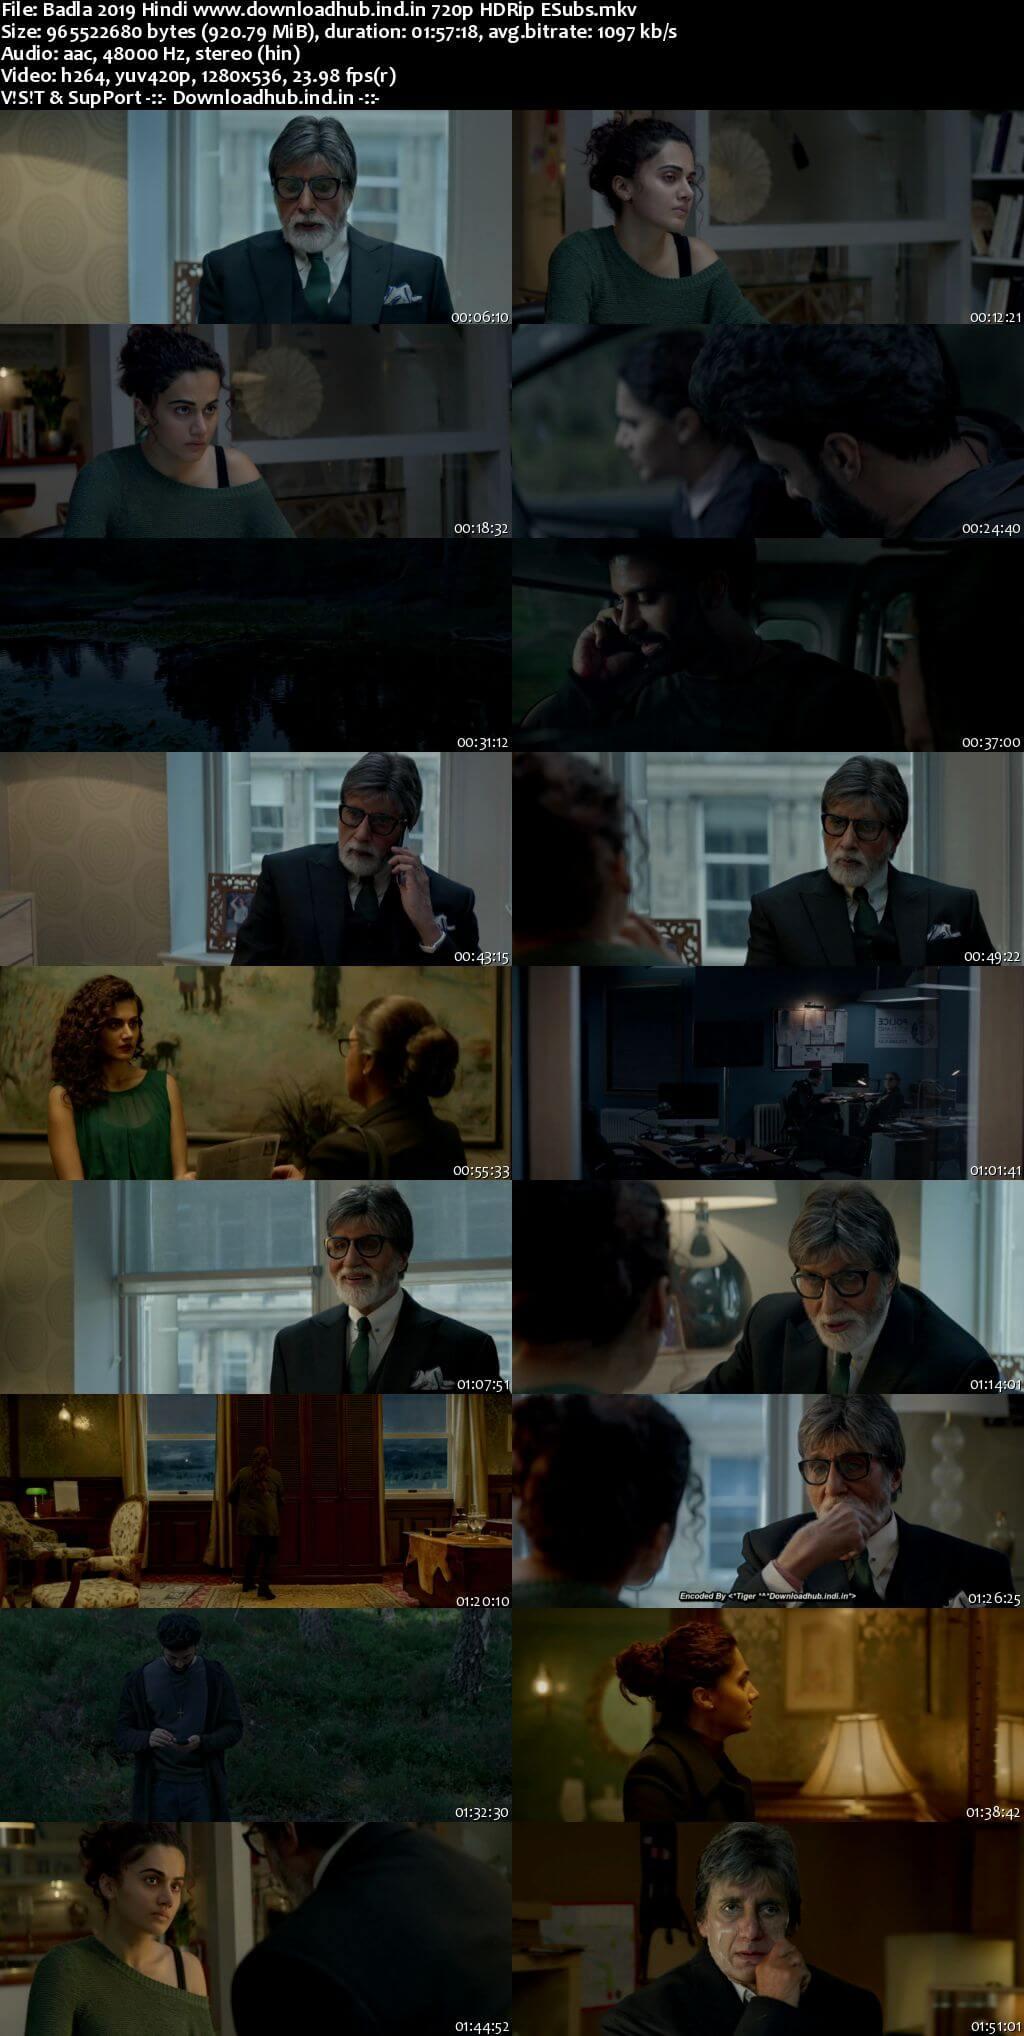 Badla 2019 Hindi 720p HDRip ESubs